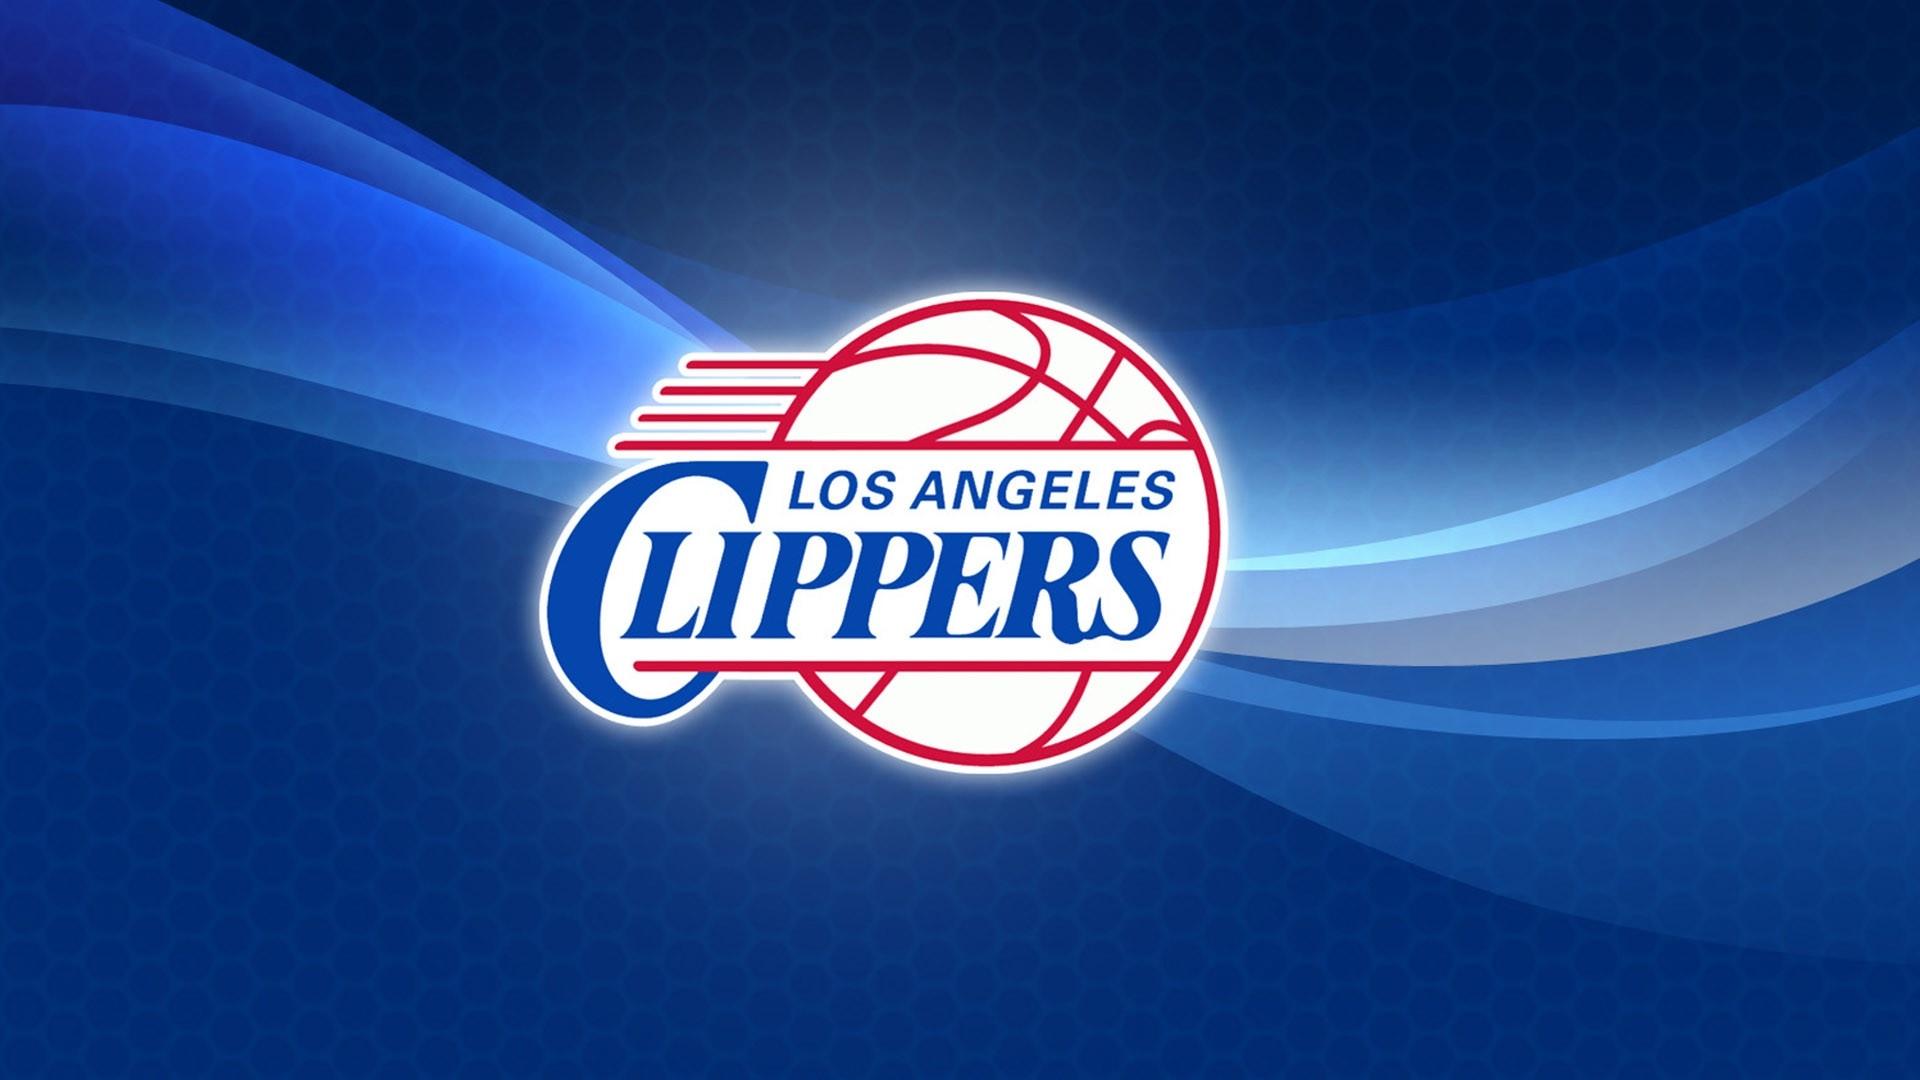 Los Angeles Clippers Desktop wallpaper